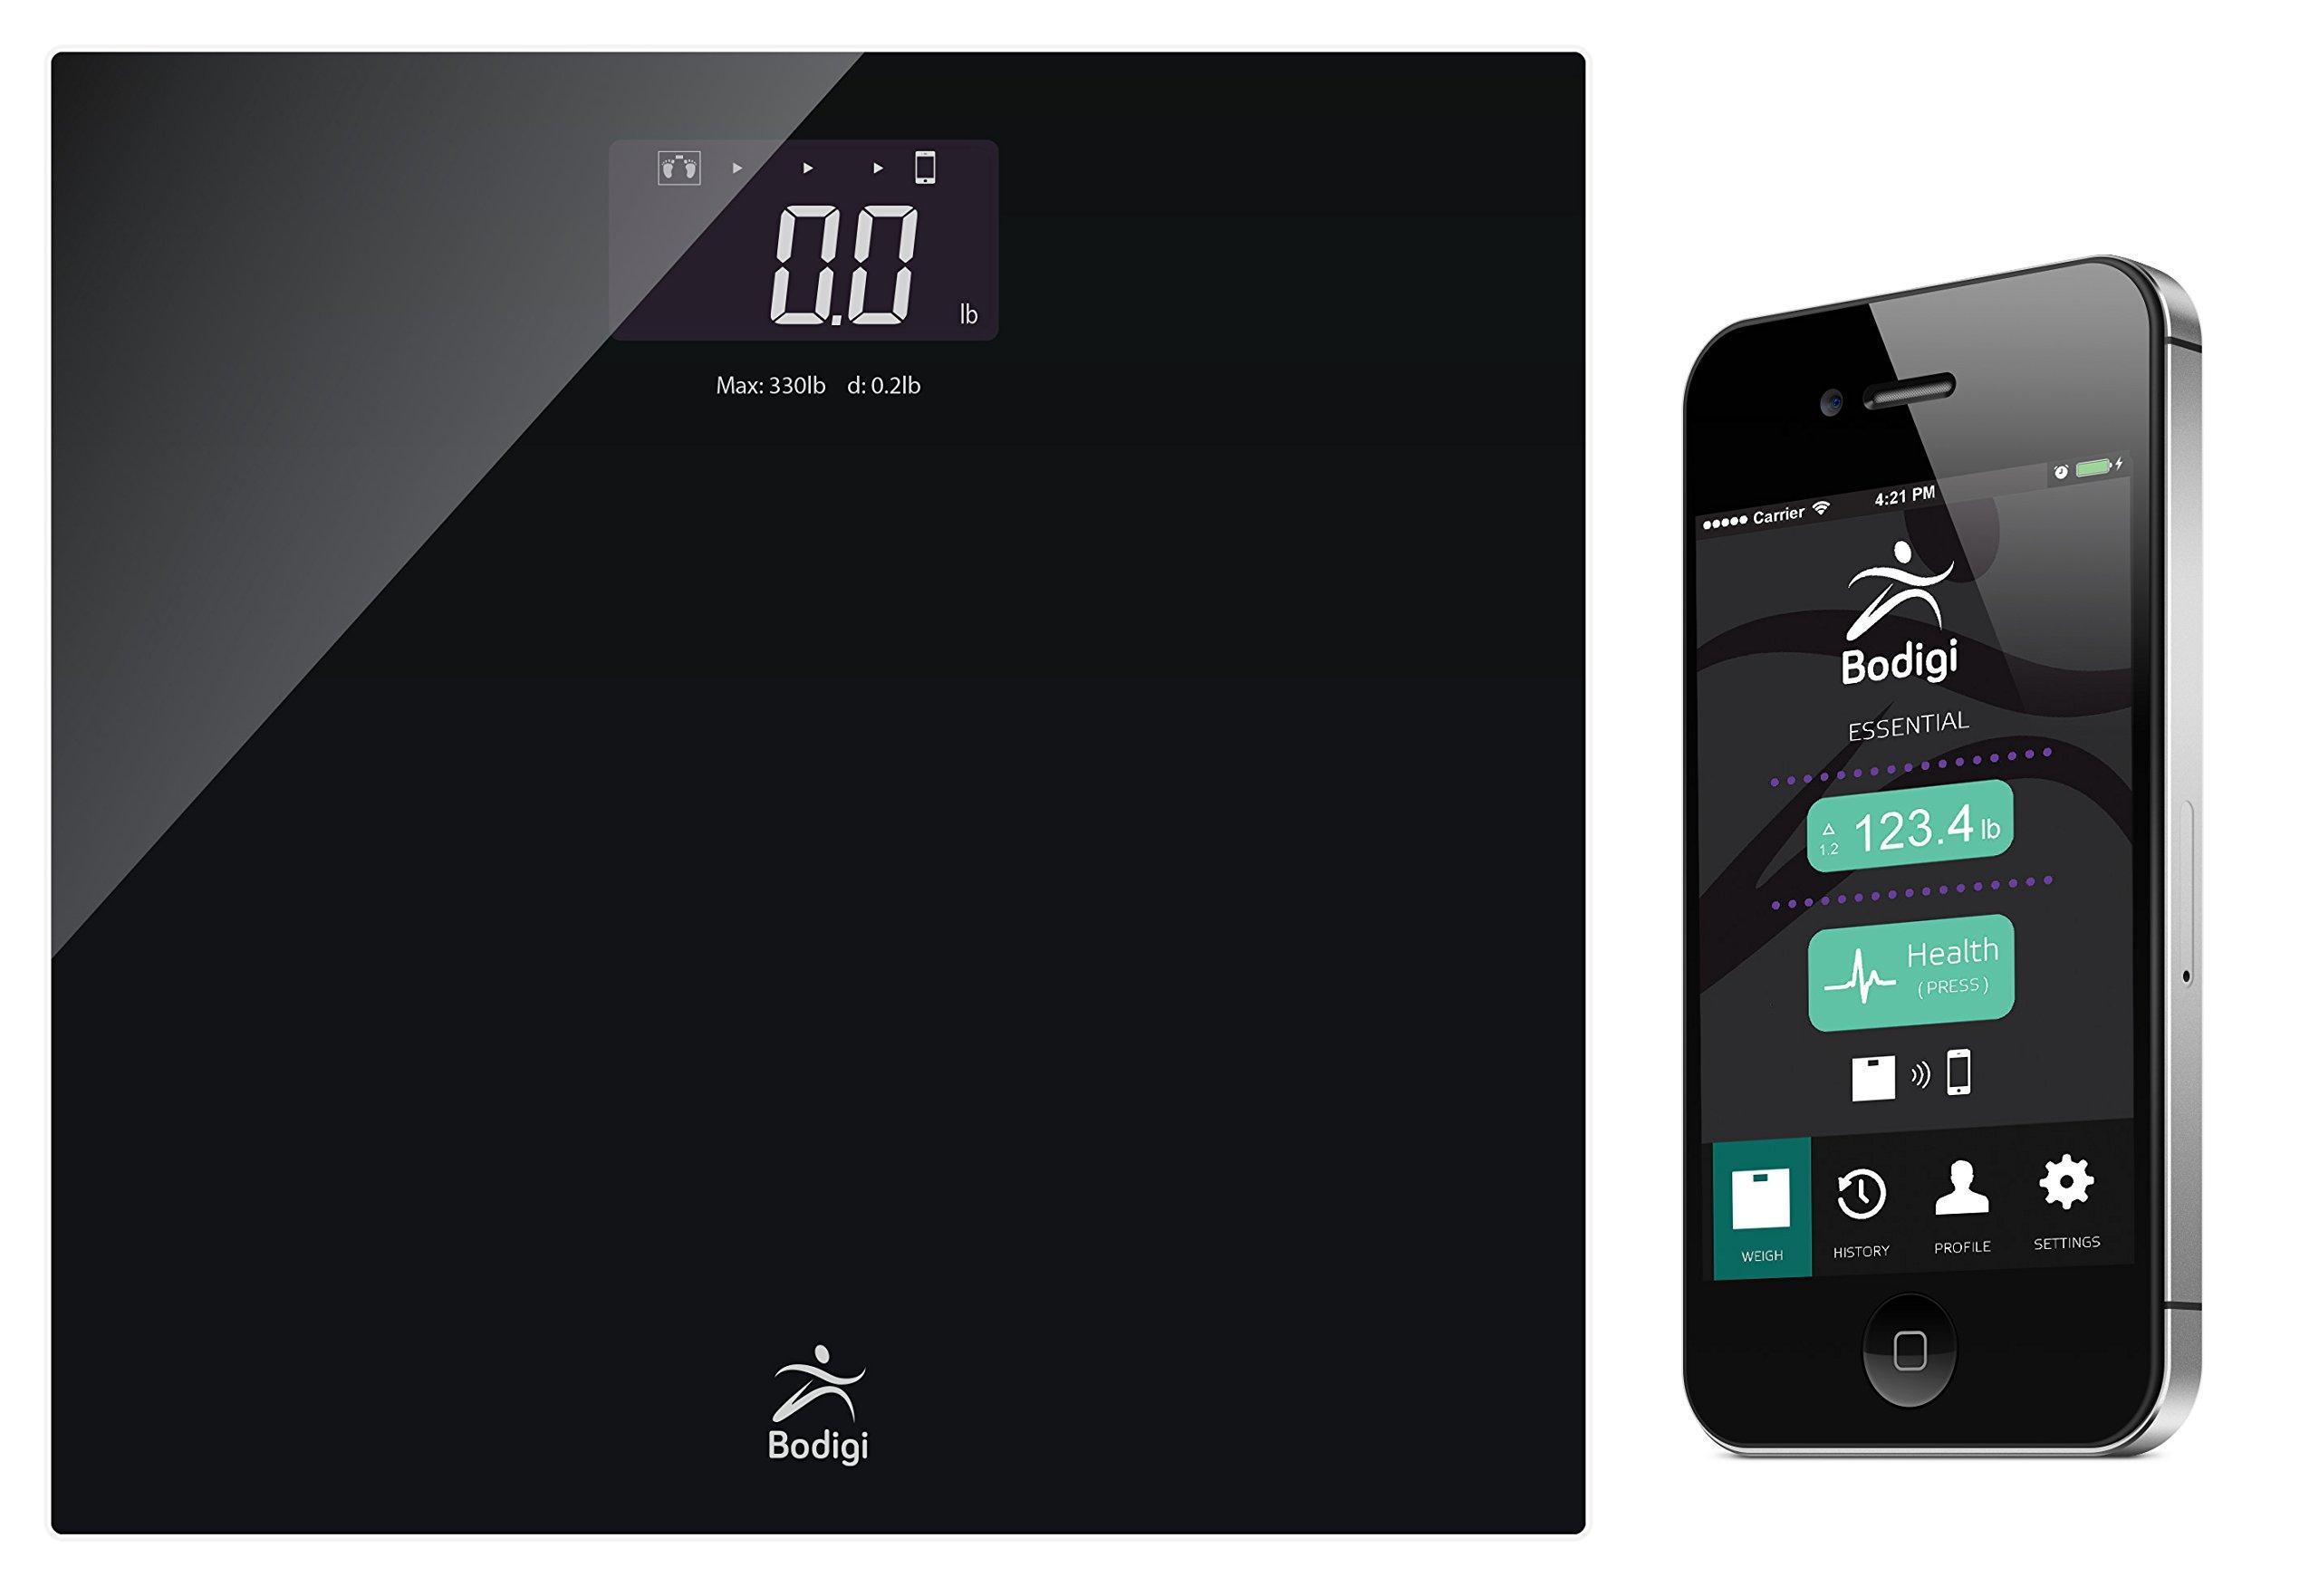 American Weigh Scales Bodigiessential Wireless Bathroom Scale